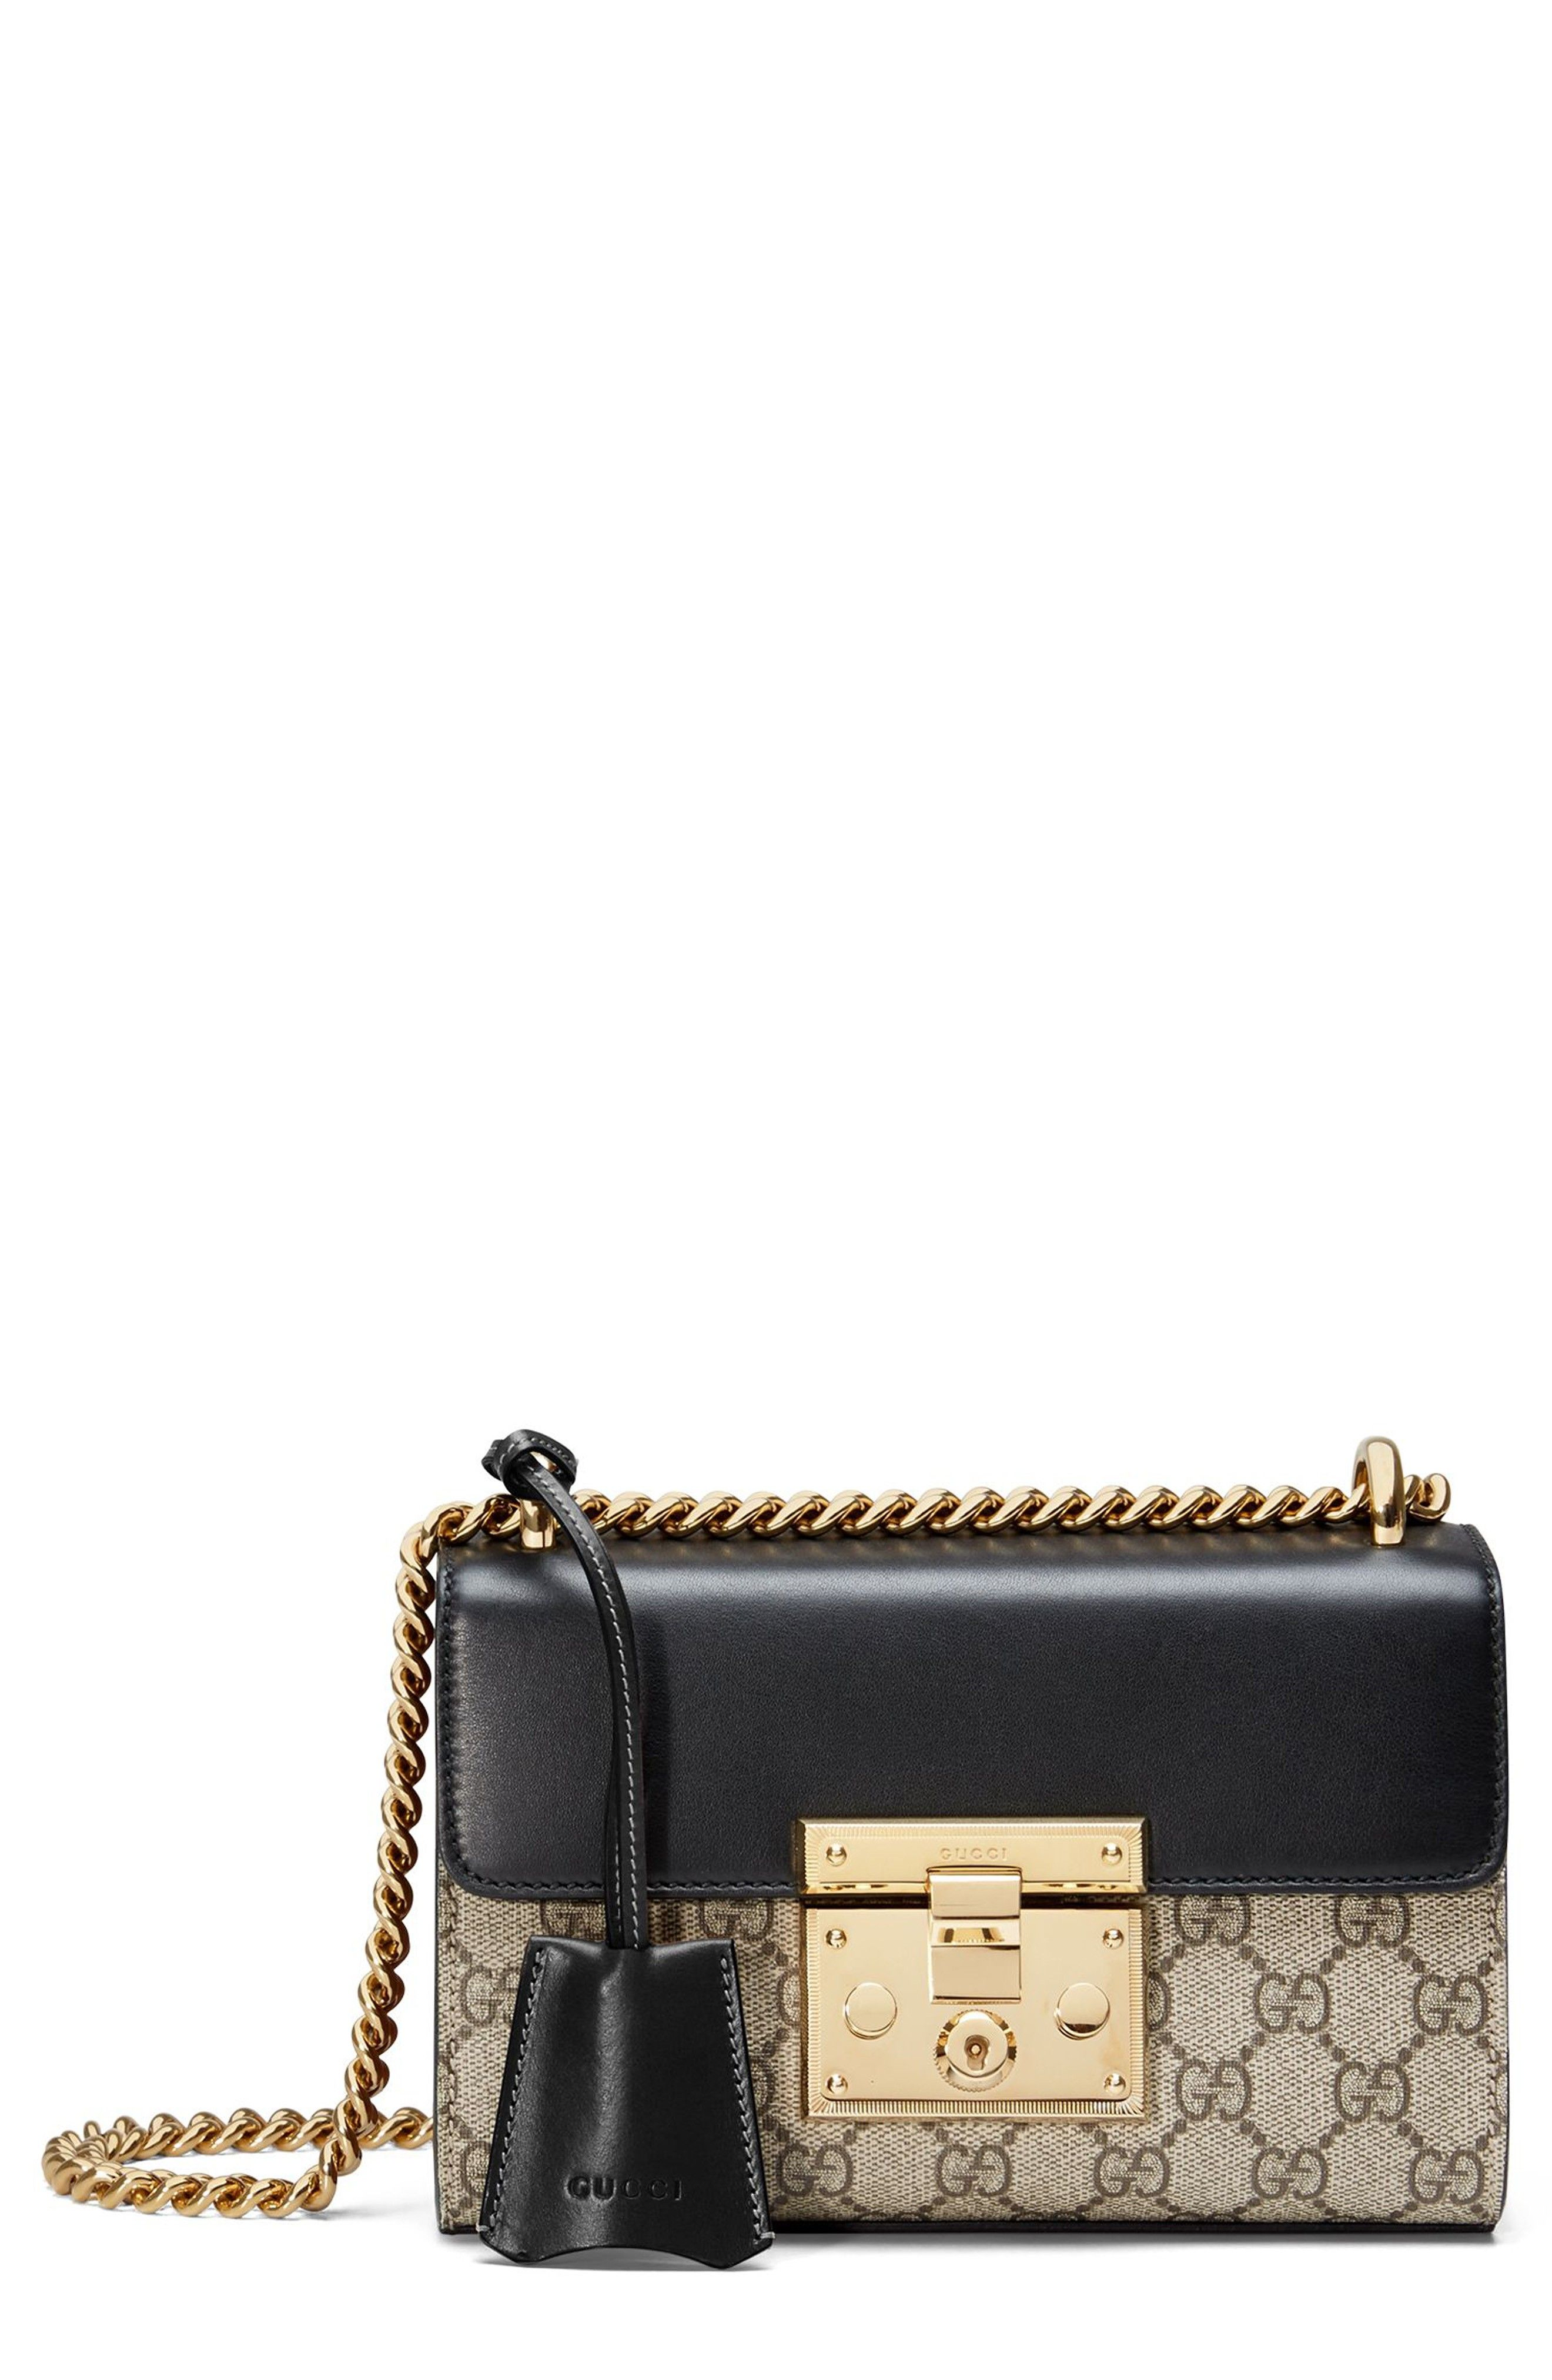 e436a97ec0b GUCCI Small Padlock Gg Supreme Canvas   Leather Shoulder Bag - Beige ...